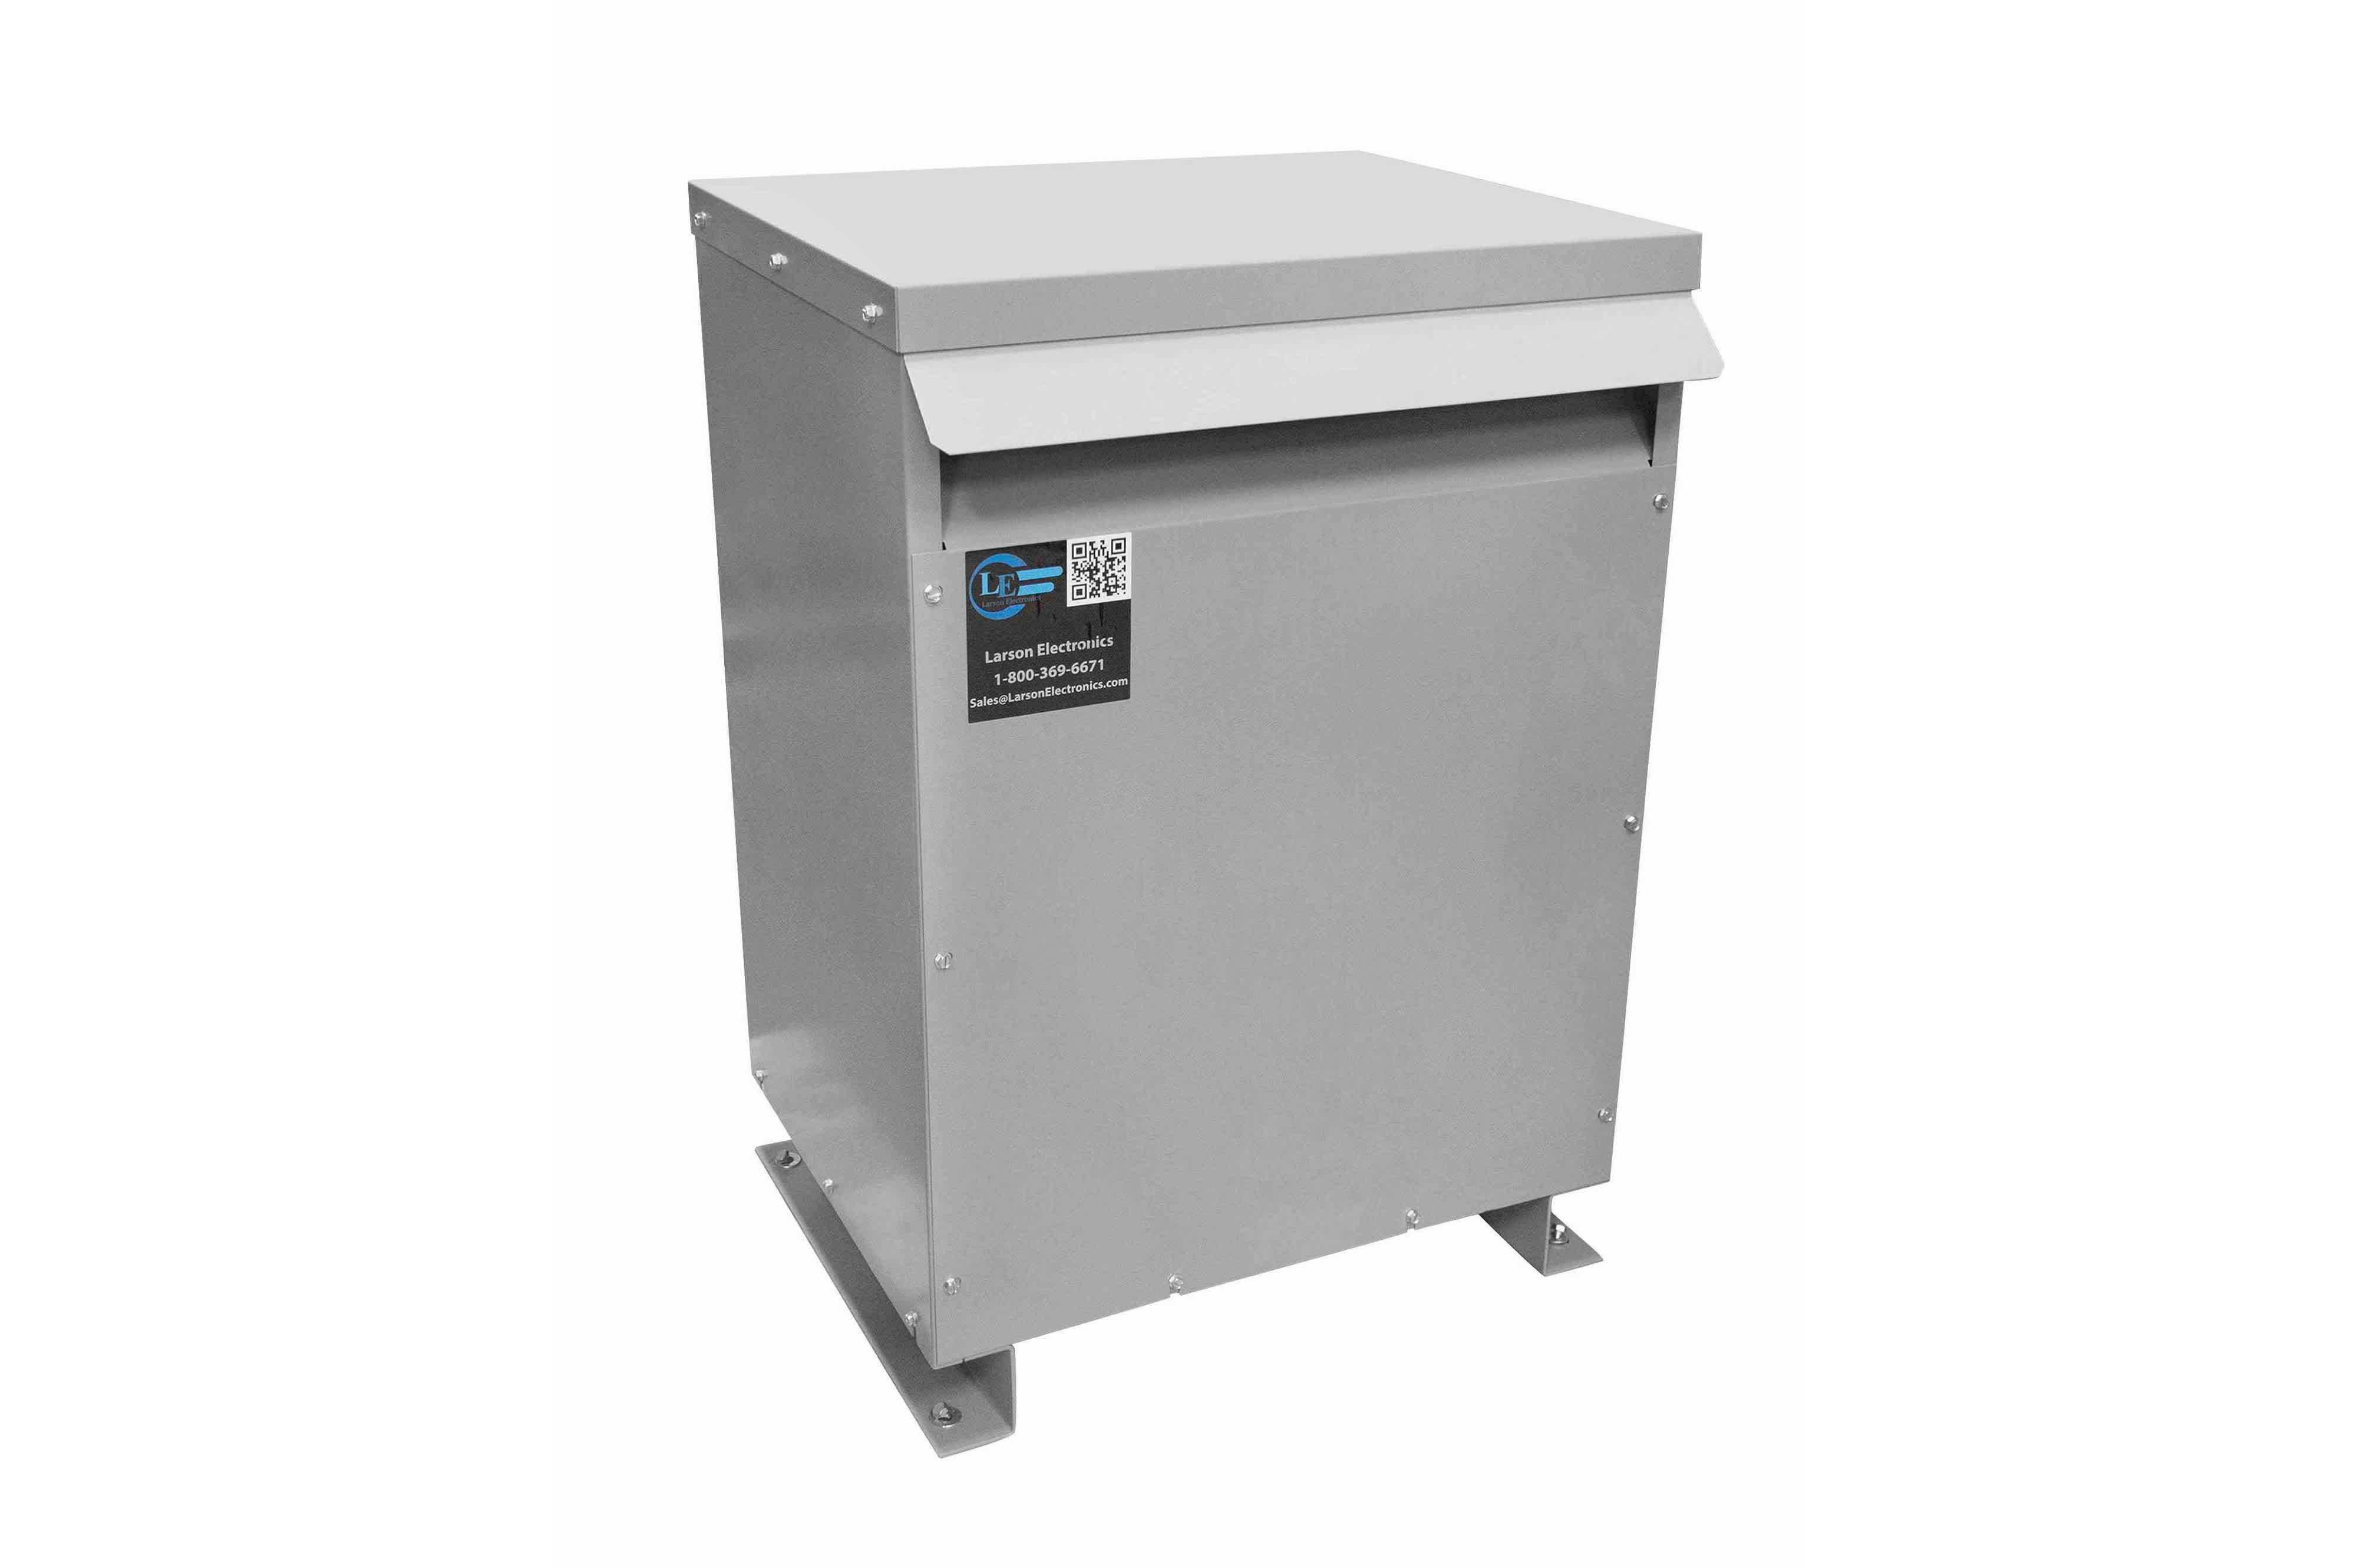 50 kVA 3PH Isolation Transformer, 575V Wye Primary, 380Y/220 Wye-N Secondary, N3R, Ventilated, 60 Hz